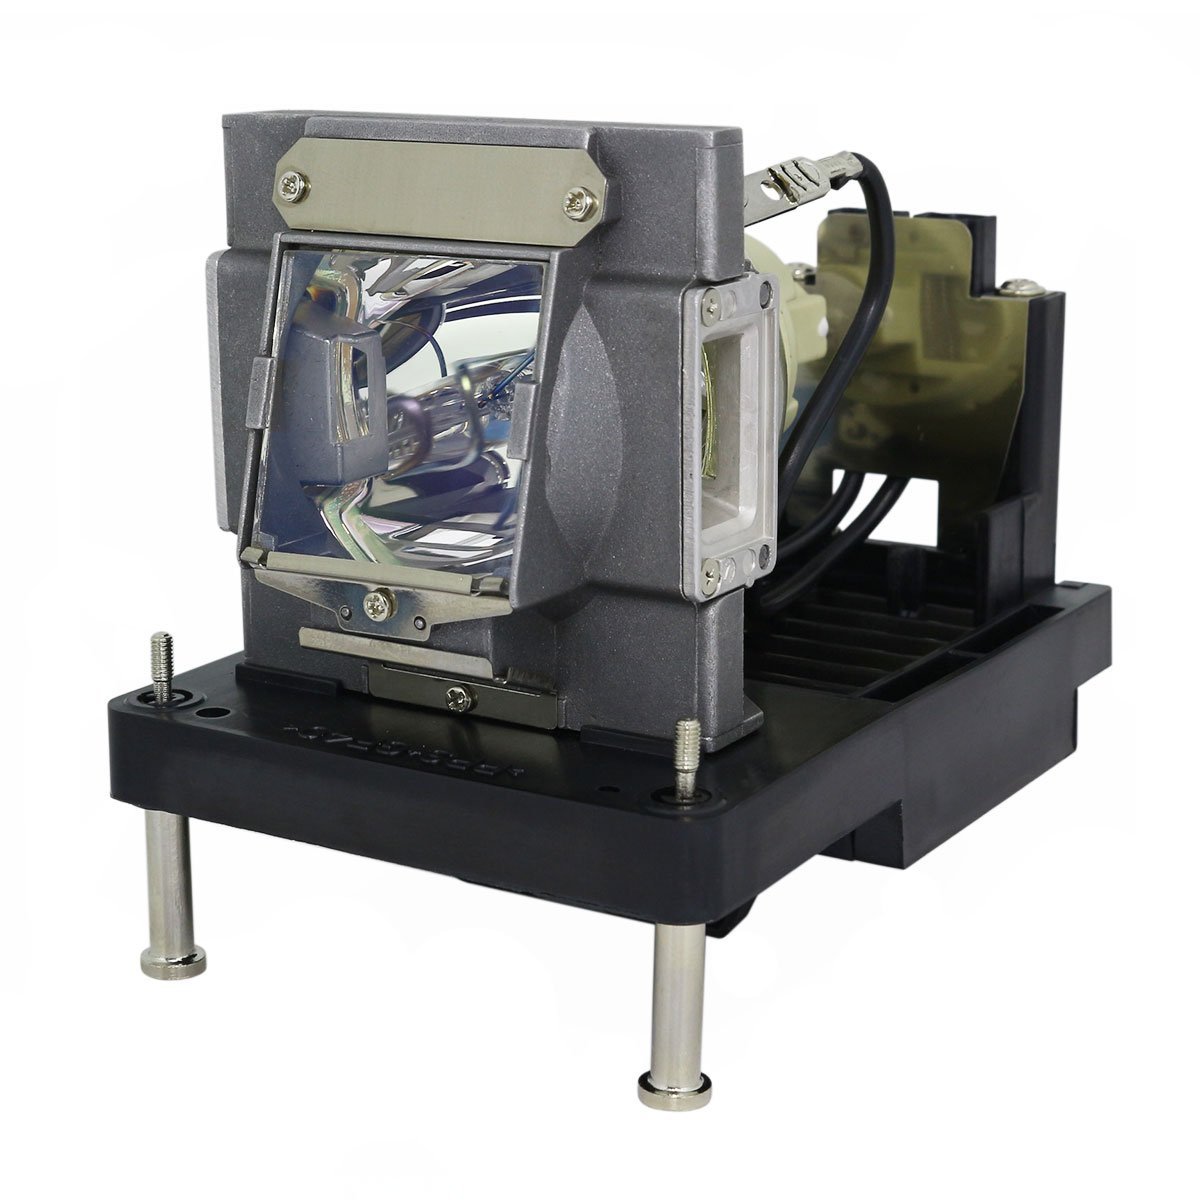 LYTIO プレミアム InFocus SP-LAMP-082 プロジェクターランプ ハウジング付き SP-LAMP082 (オリジナルフィリップス電球内蔵)   B07JJ2X42X